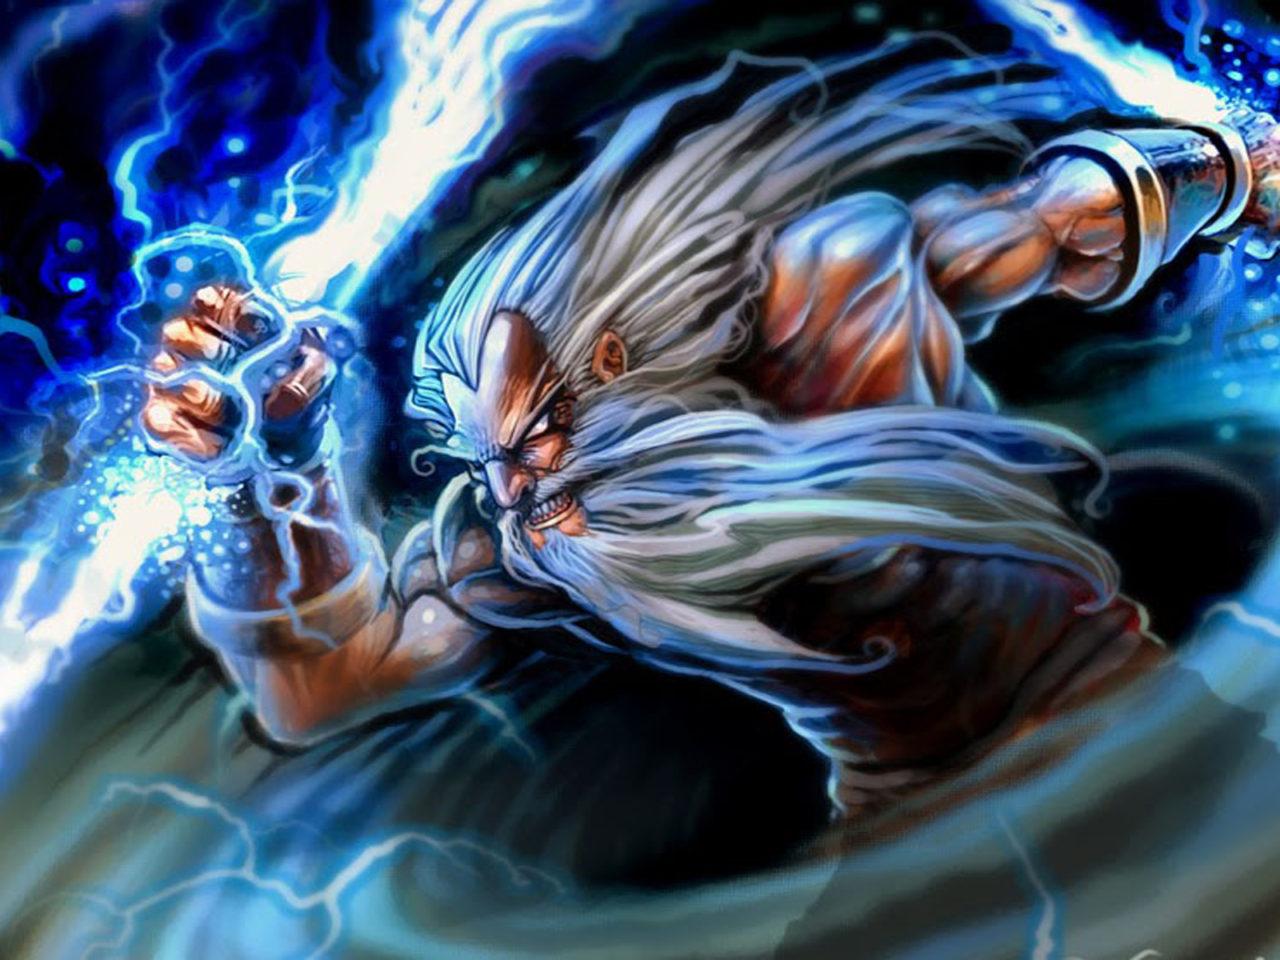 Download Cars Wallpapers For Mobile Video Games Dota 2 Caracters Zeus Greek God Myths Desktop